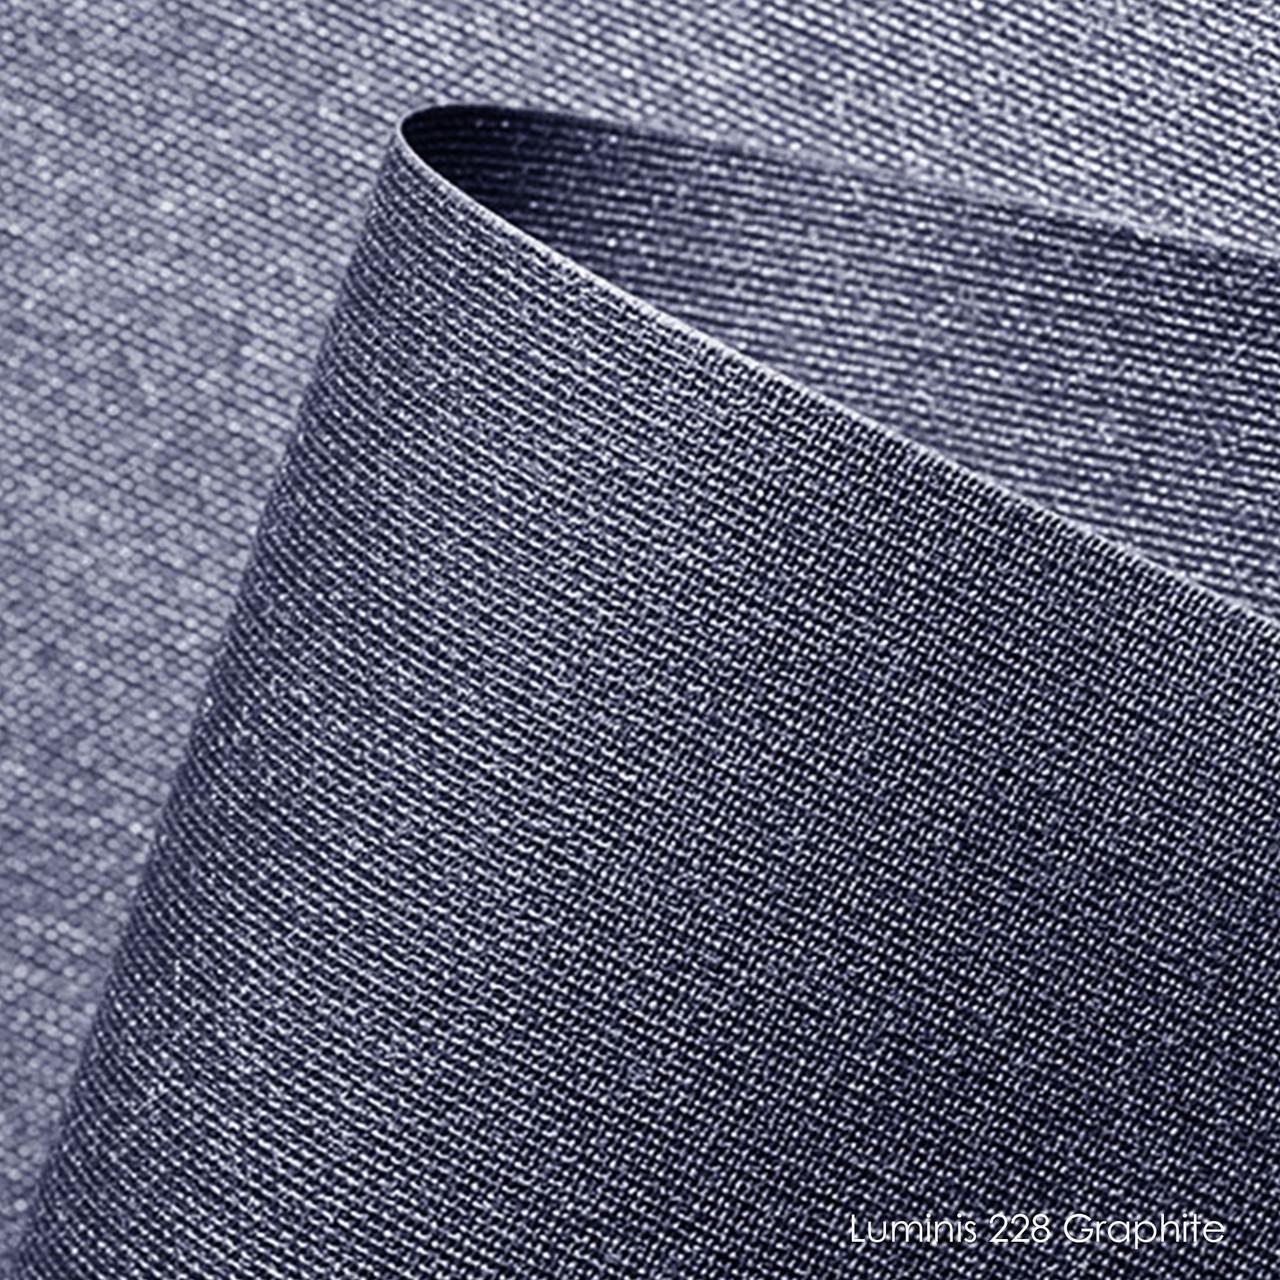 Ролеты тканевые Luminis-228 graphite